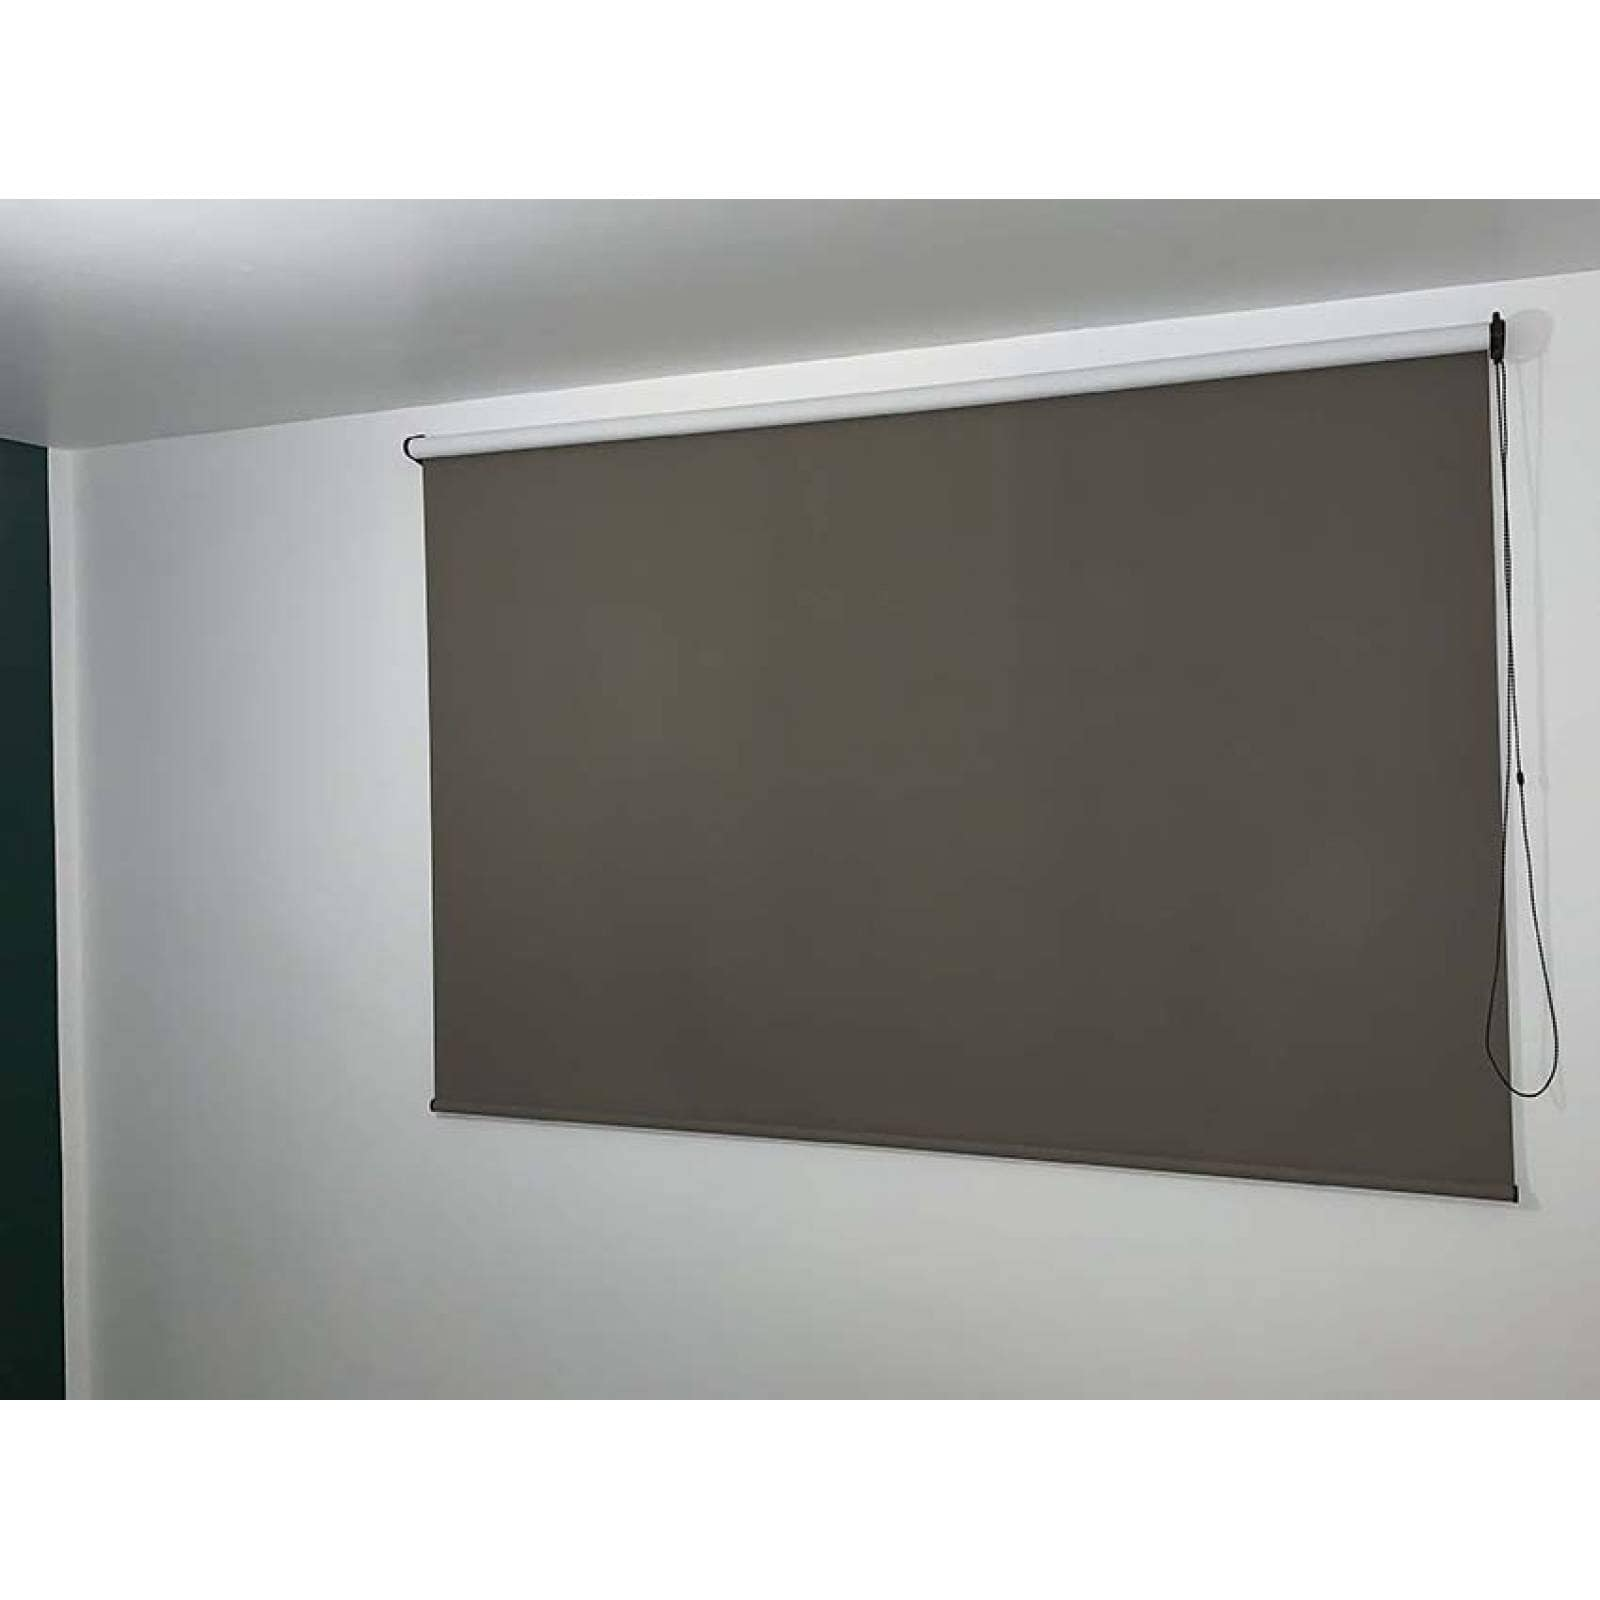 Persianas Blackout modelo 500 180 cm de ancho X hasta 150 cm de largo